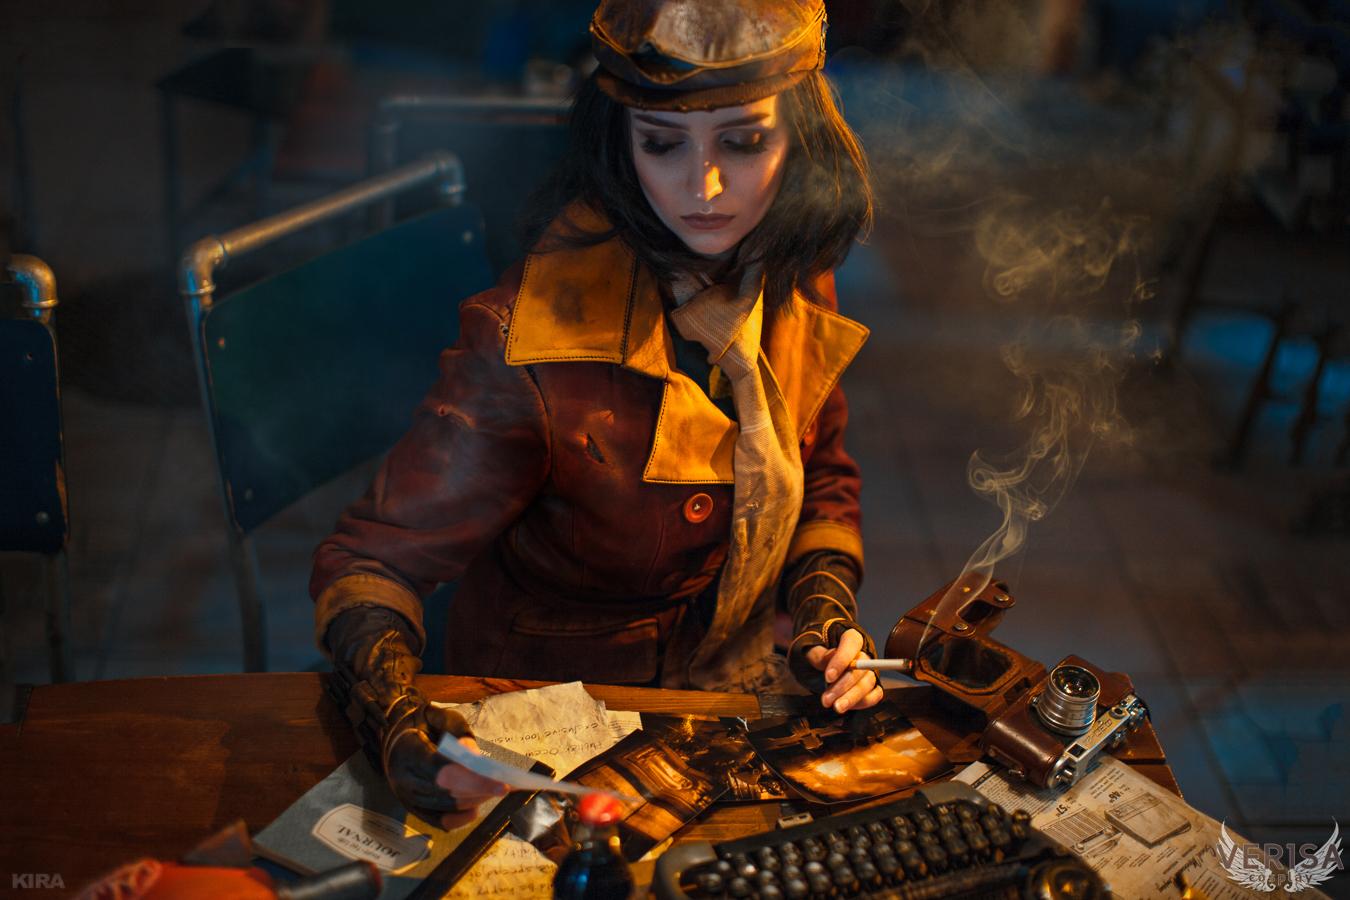 Fallout総合 エロ・嫁・ロリSS/MOD晒しスレッド 3 [無断転載禁止]©bbspink.comYouTube動画>3本 ->画像>31枚